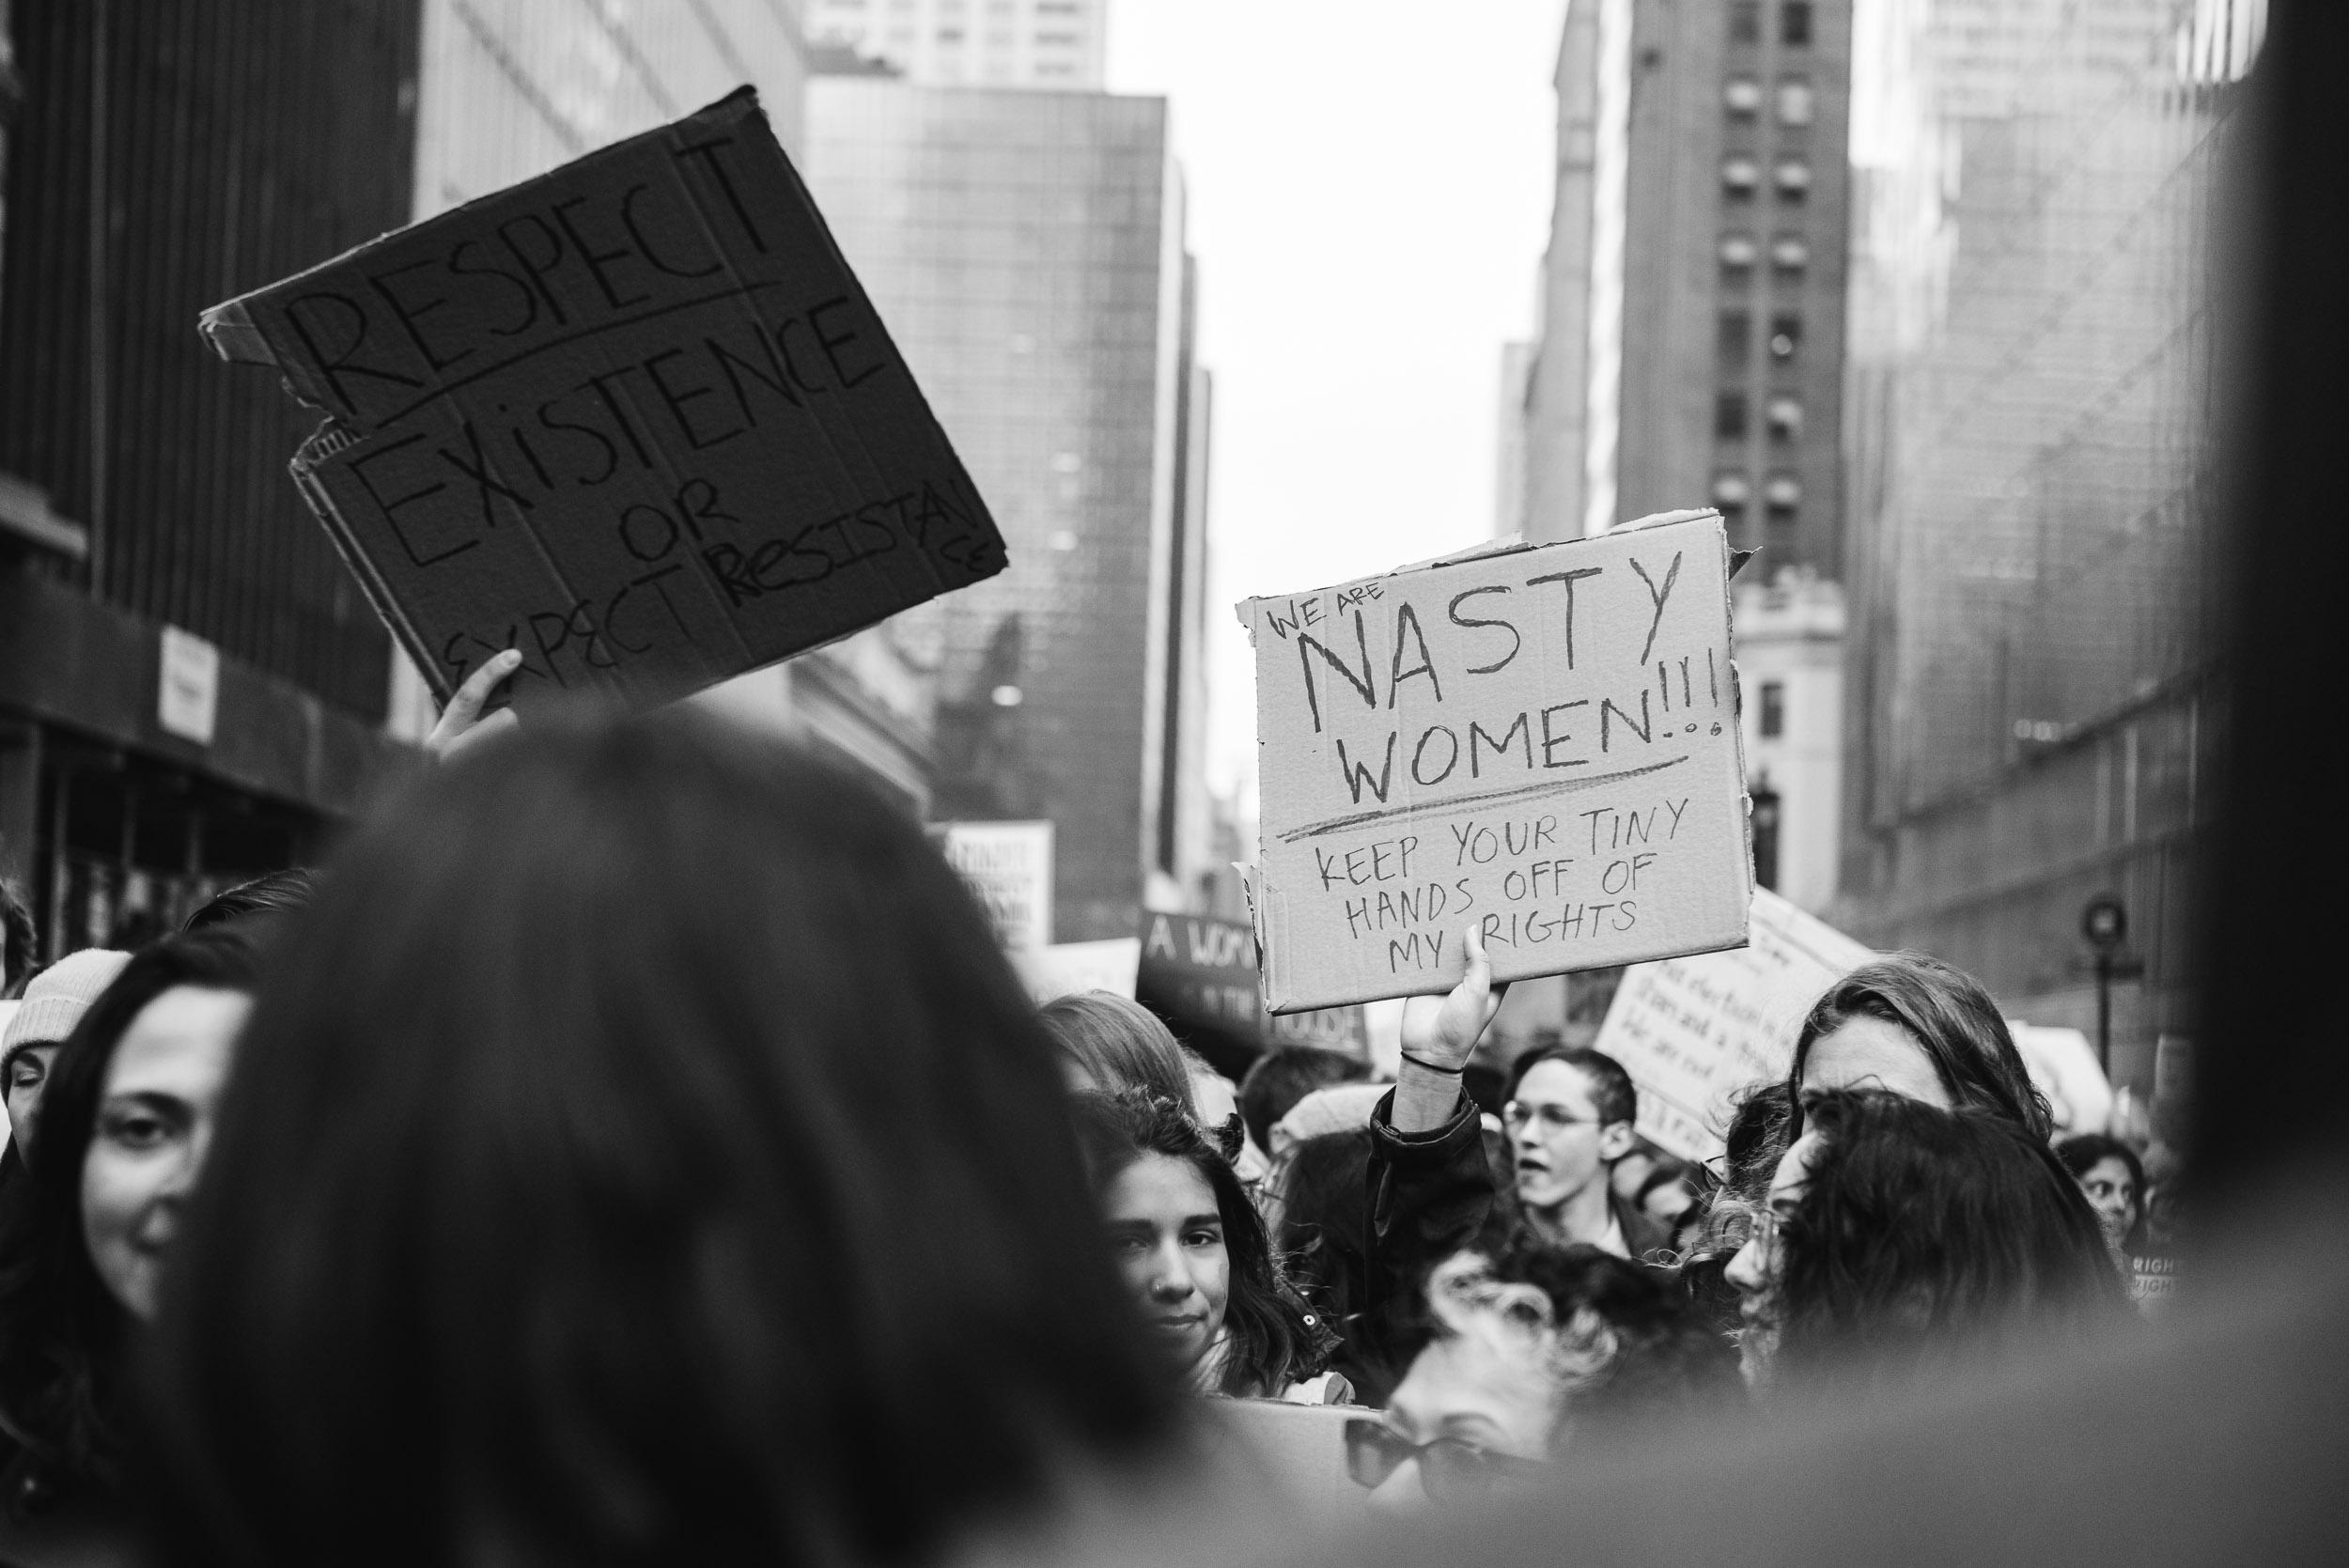 20170121 - NYC Women's March-37.jpg